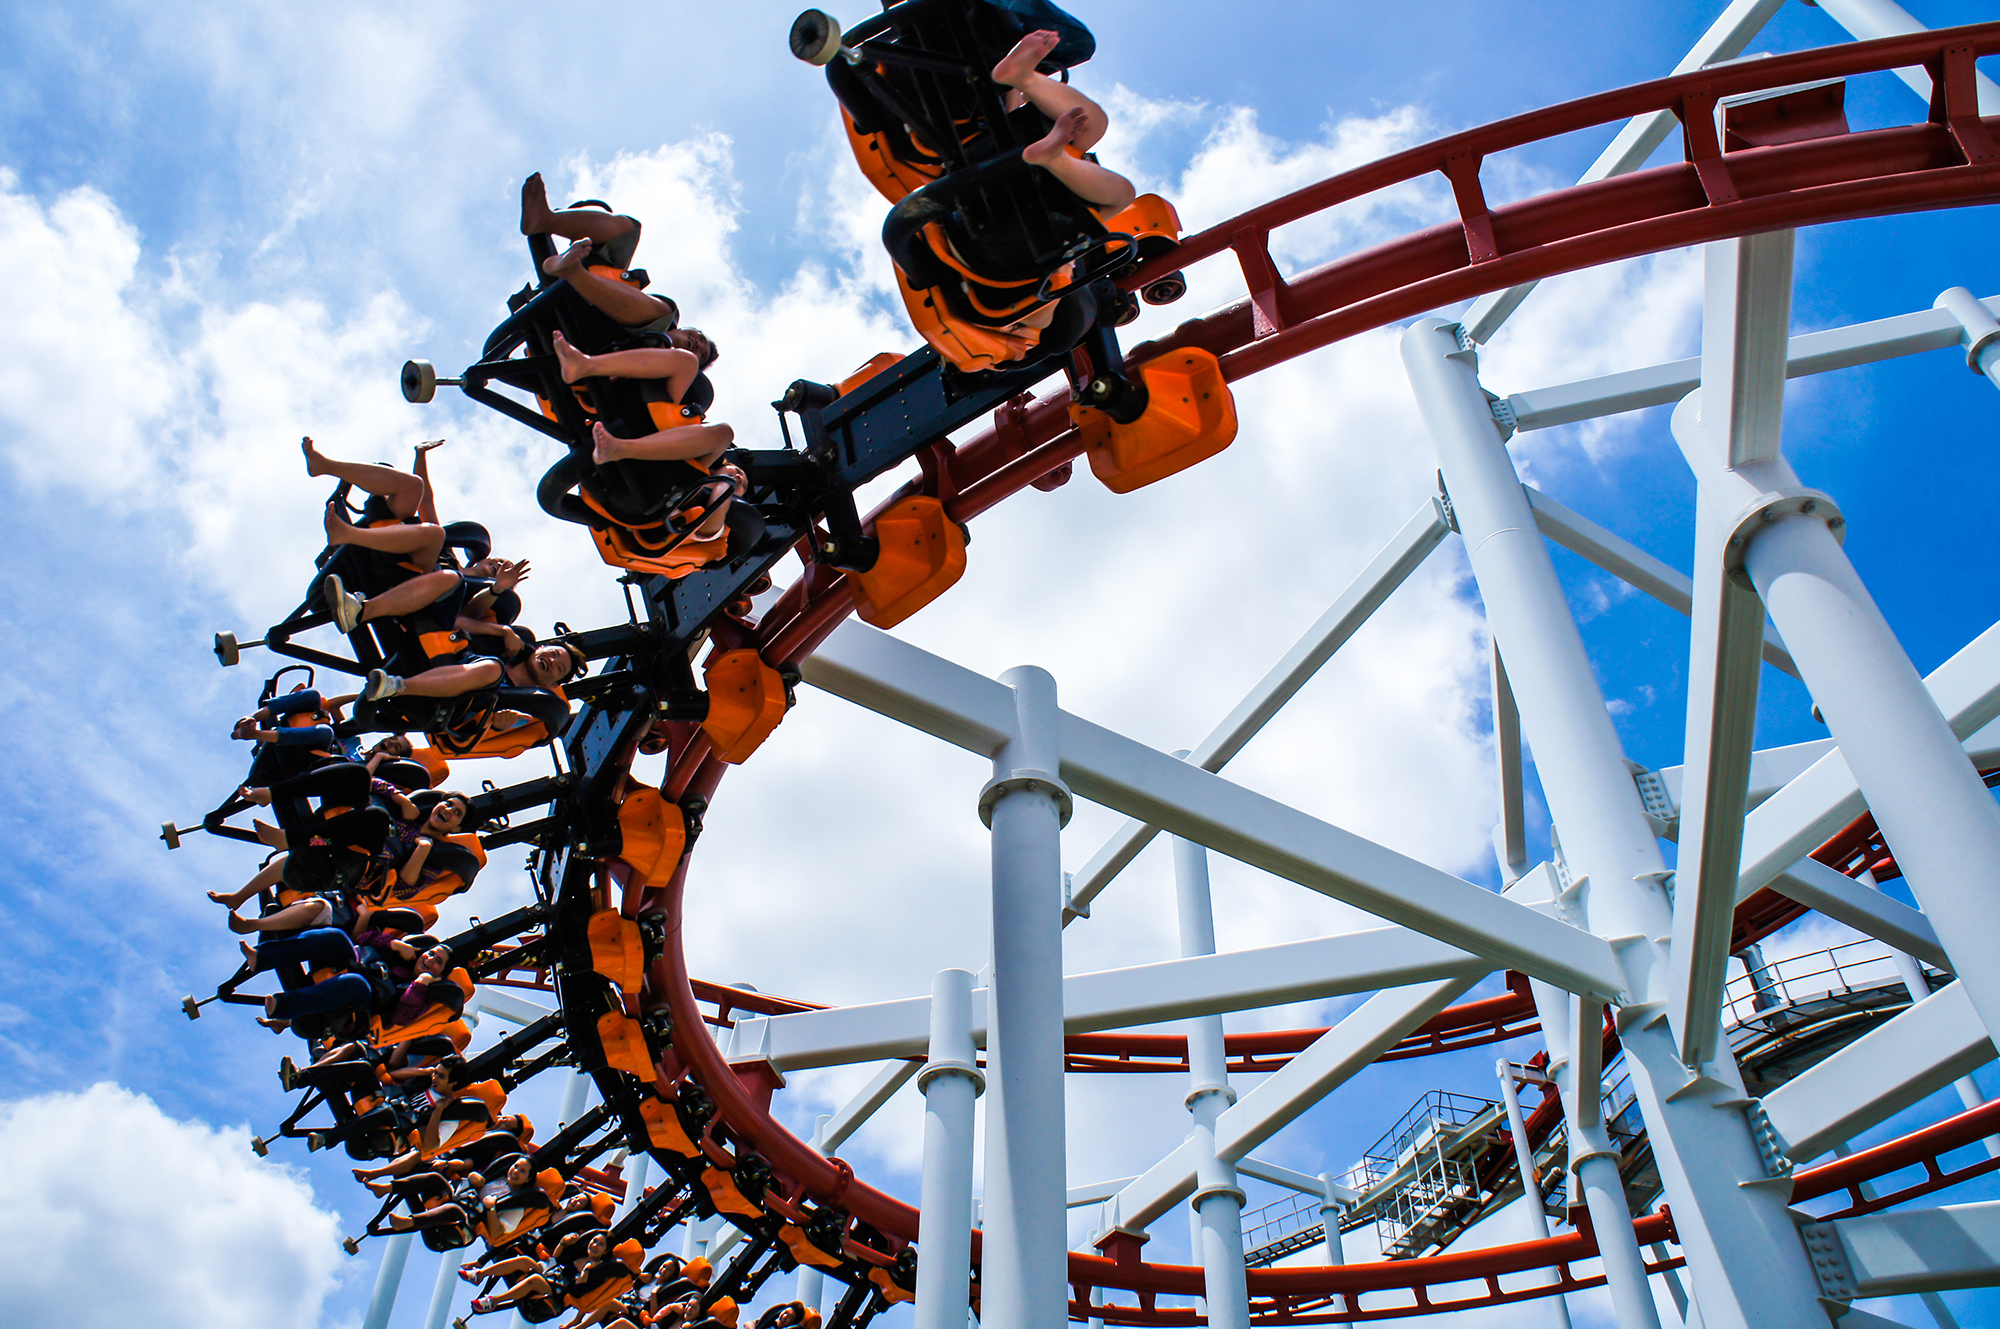 Theme park ride. (Image: Shutterstock)